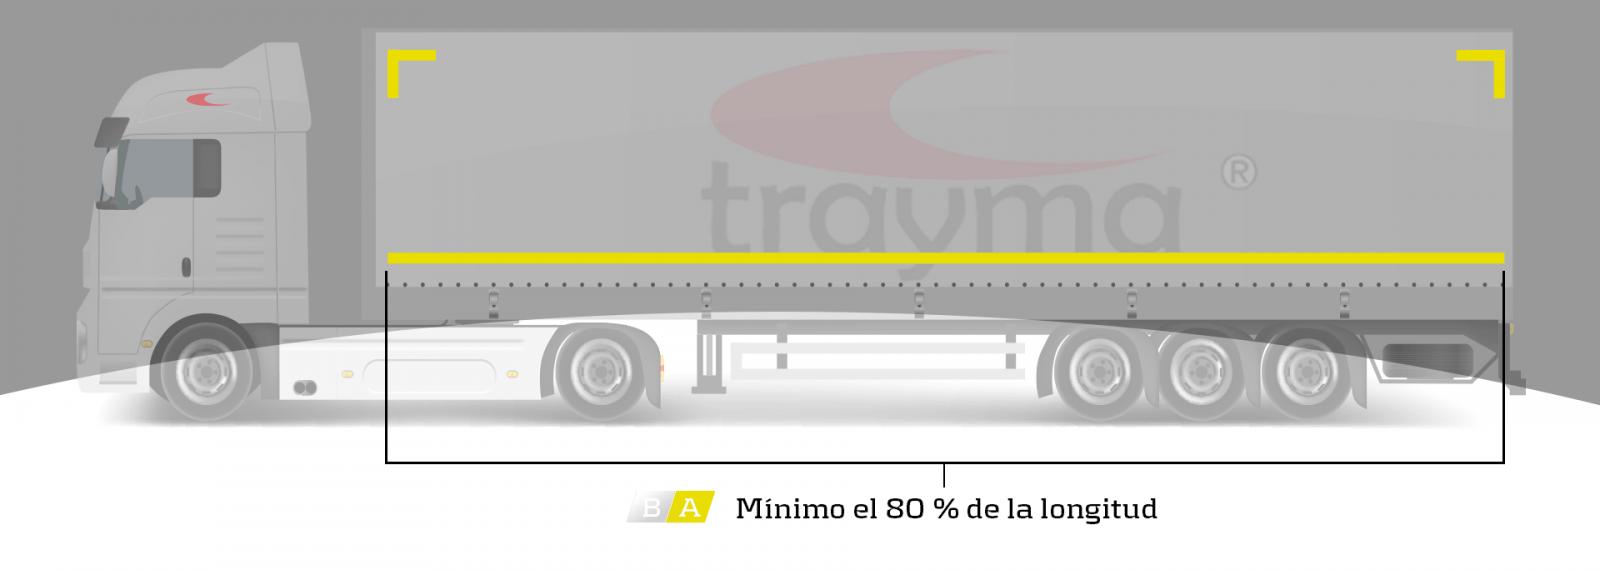 Como marcar el camión con bandas reflectantes